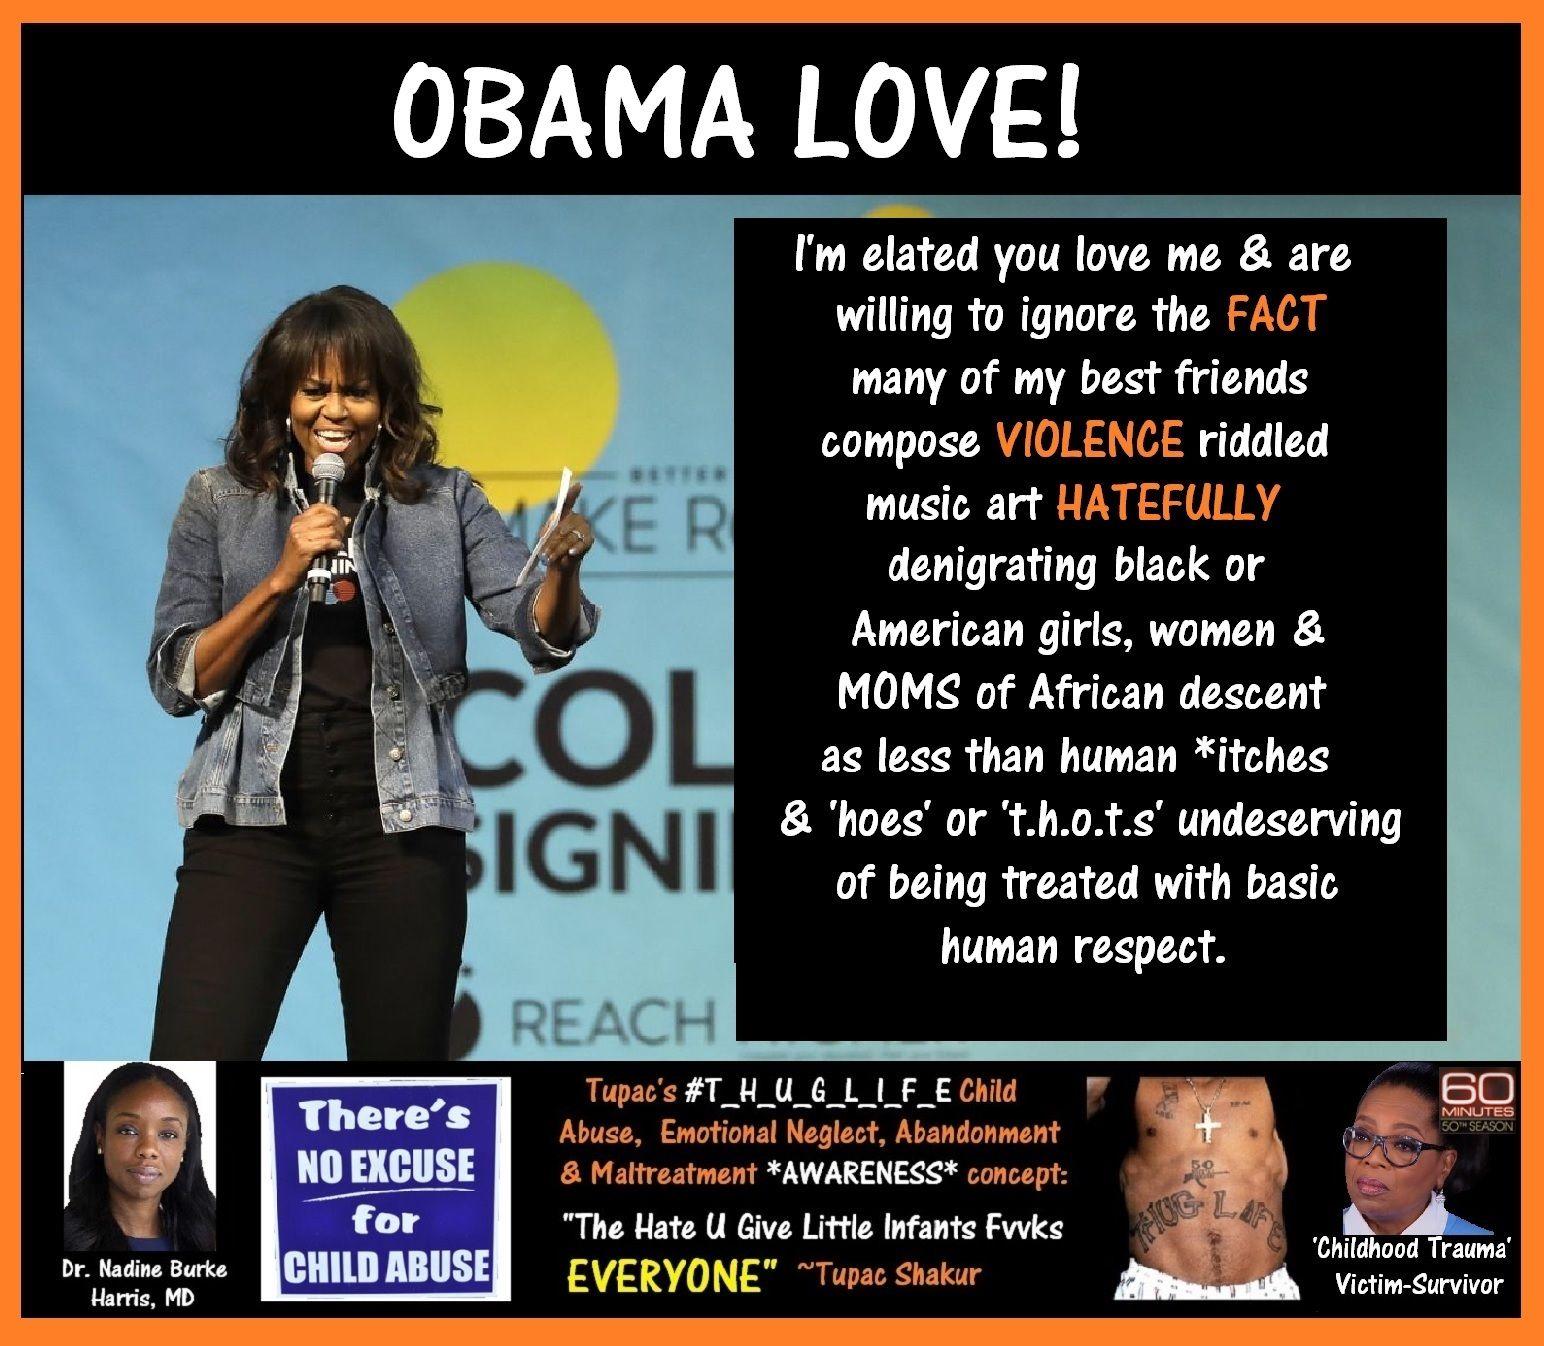 Obama_Love.jpg